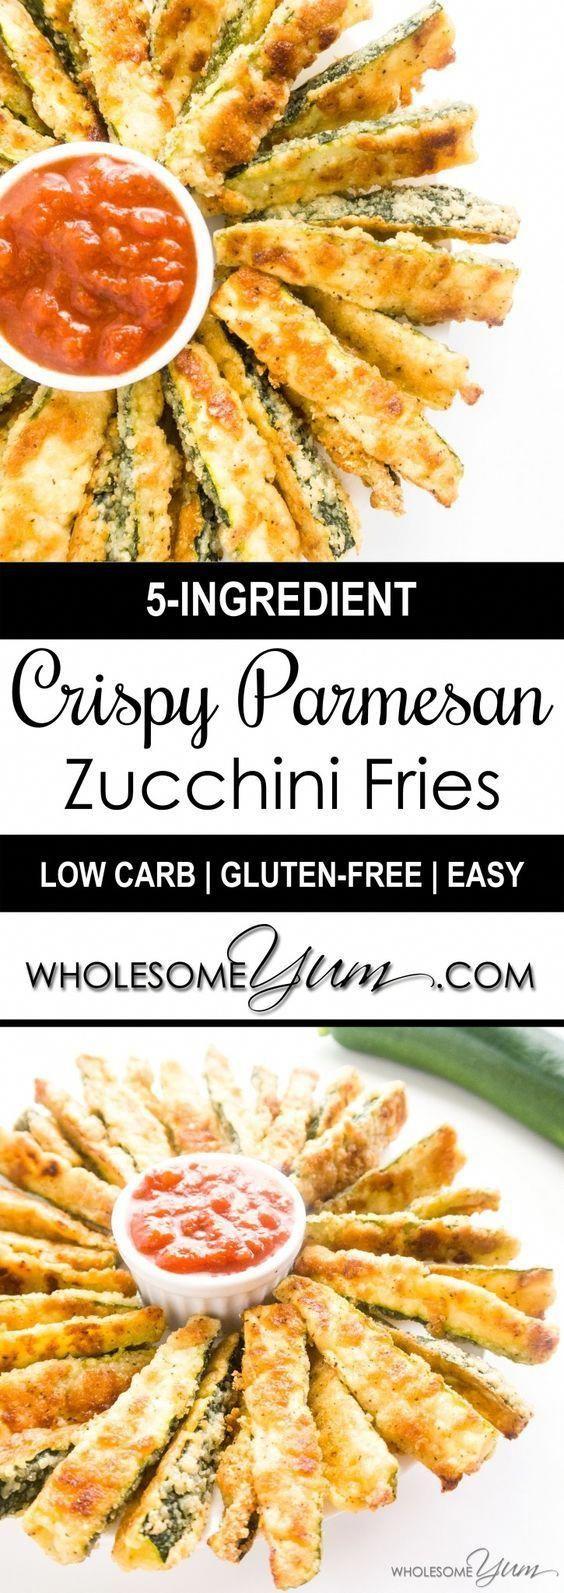 Crispy Parmesan Zucchini Fries (Low Carb, Gluten-free) #FoodandDrink